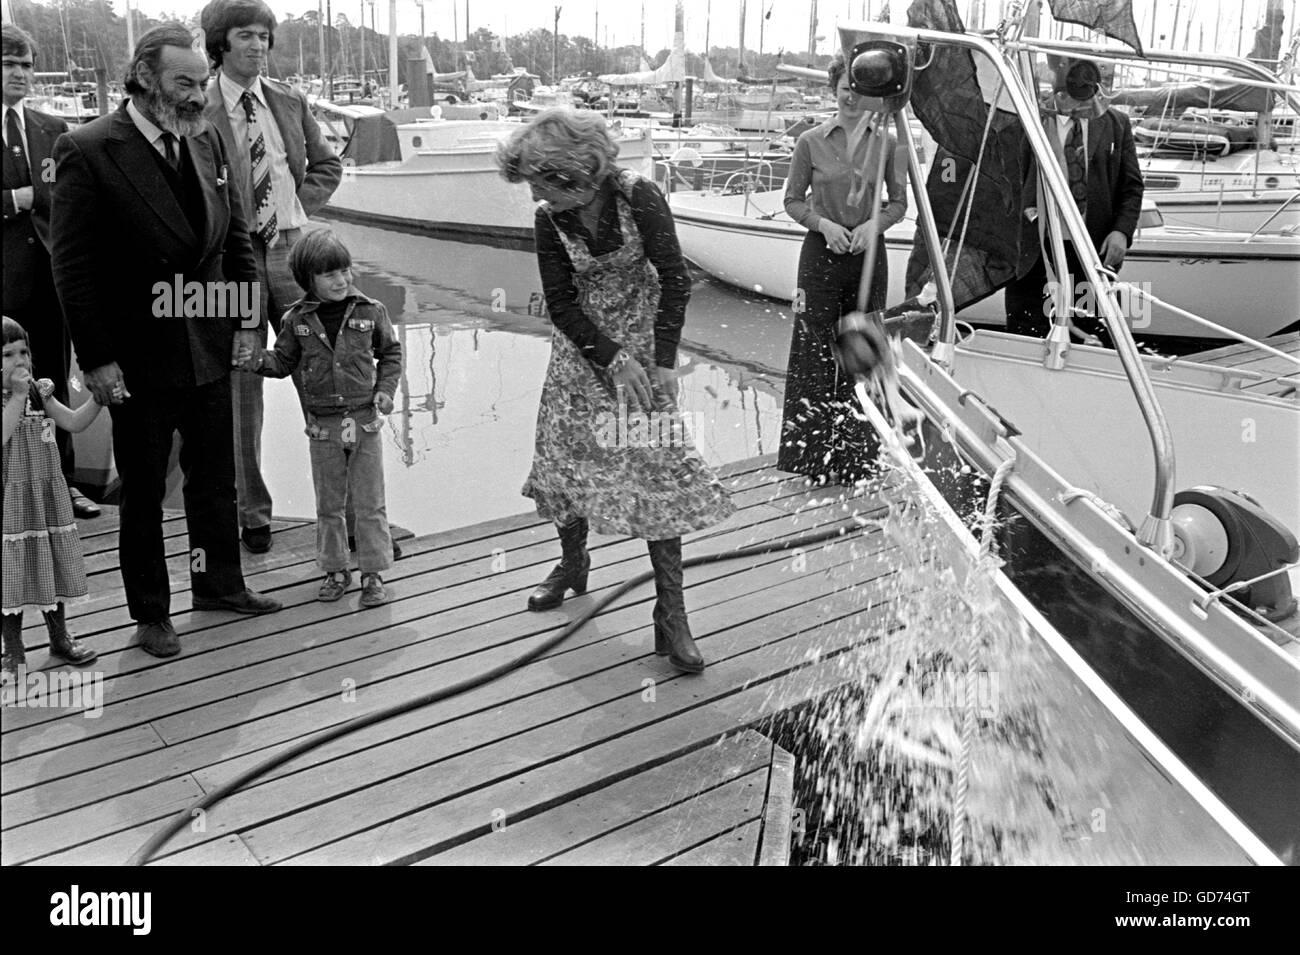 AJAXNETPHOTO. 1976. SWANICK, Angleterre. (L-R) ANGUS PRIMROSE (BARBE AVEC_ LOOKIS SUR TANDIS QUE SA FEMME DÉMON Photo Stock